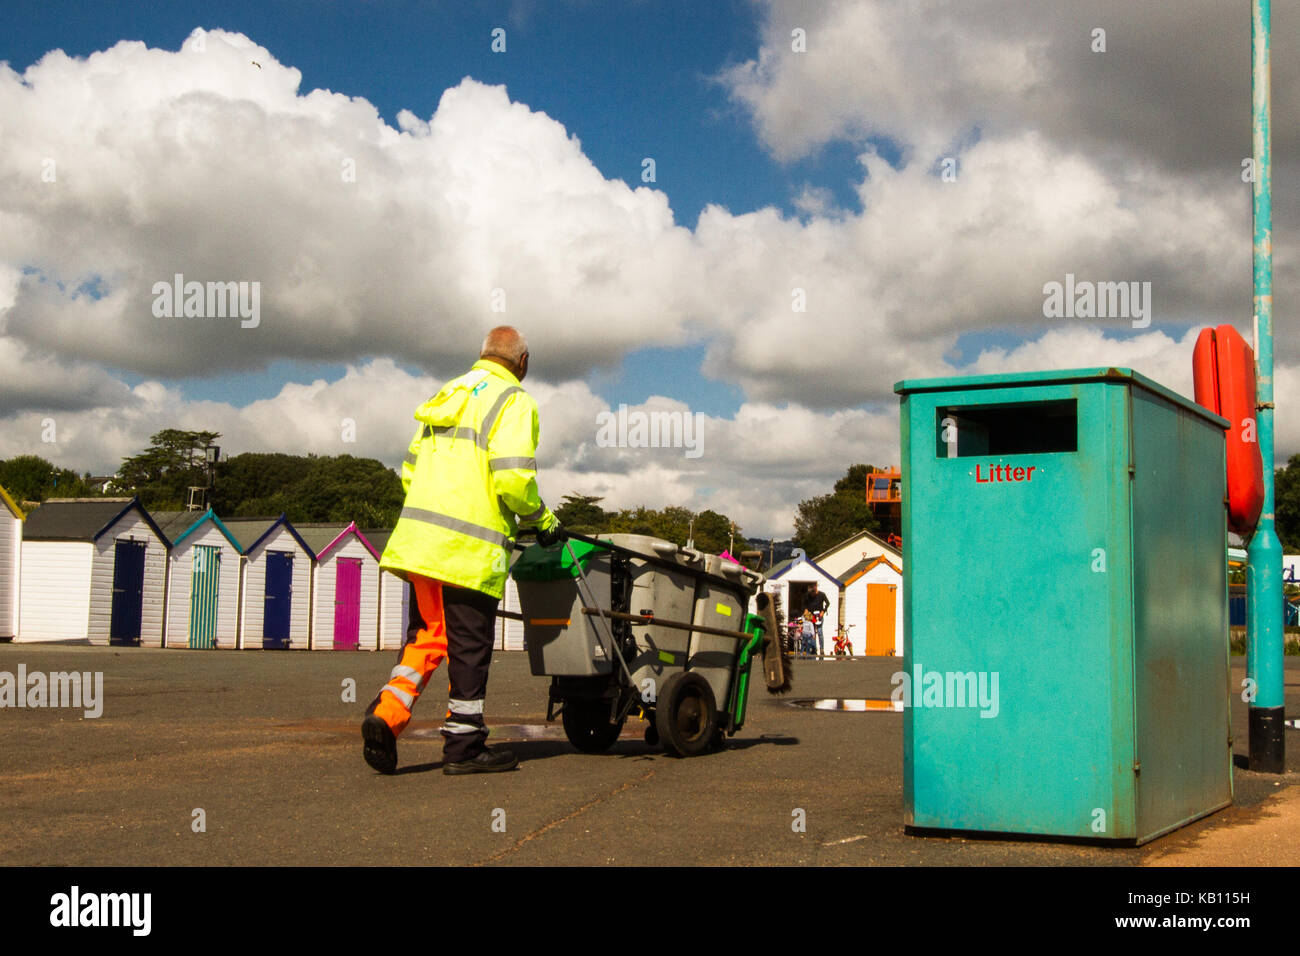 Seaside Beach basura basura recogida, gestión de residuos Imagen De Stock